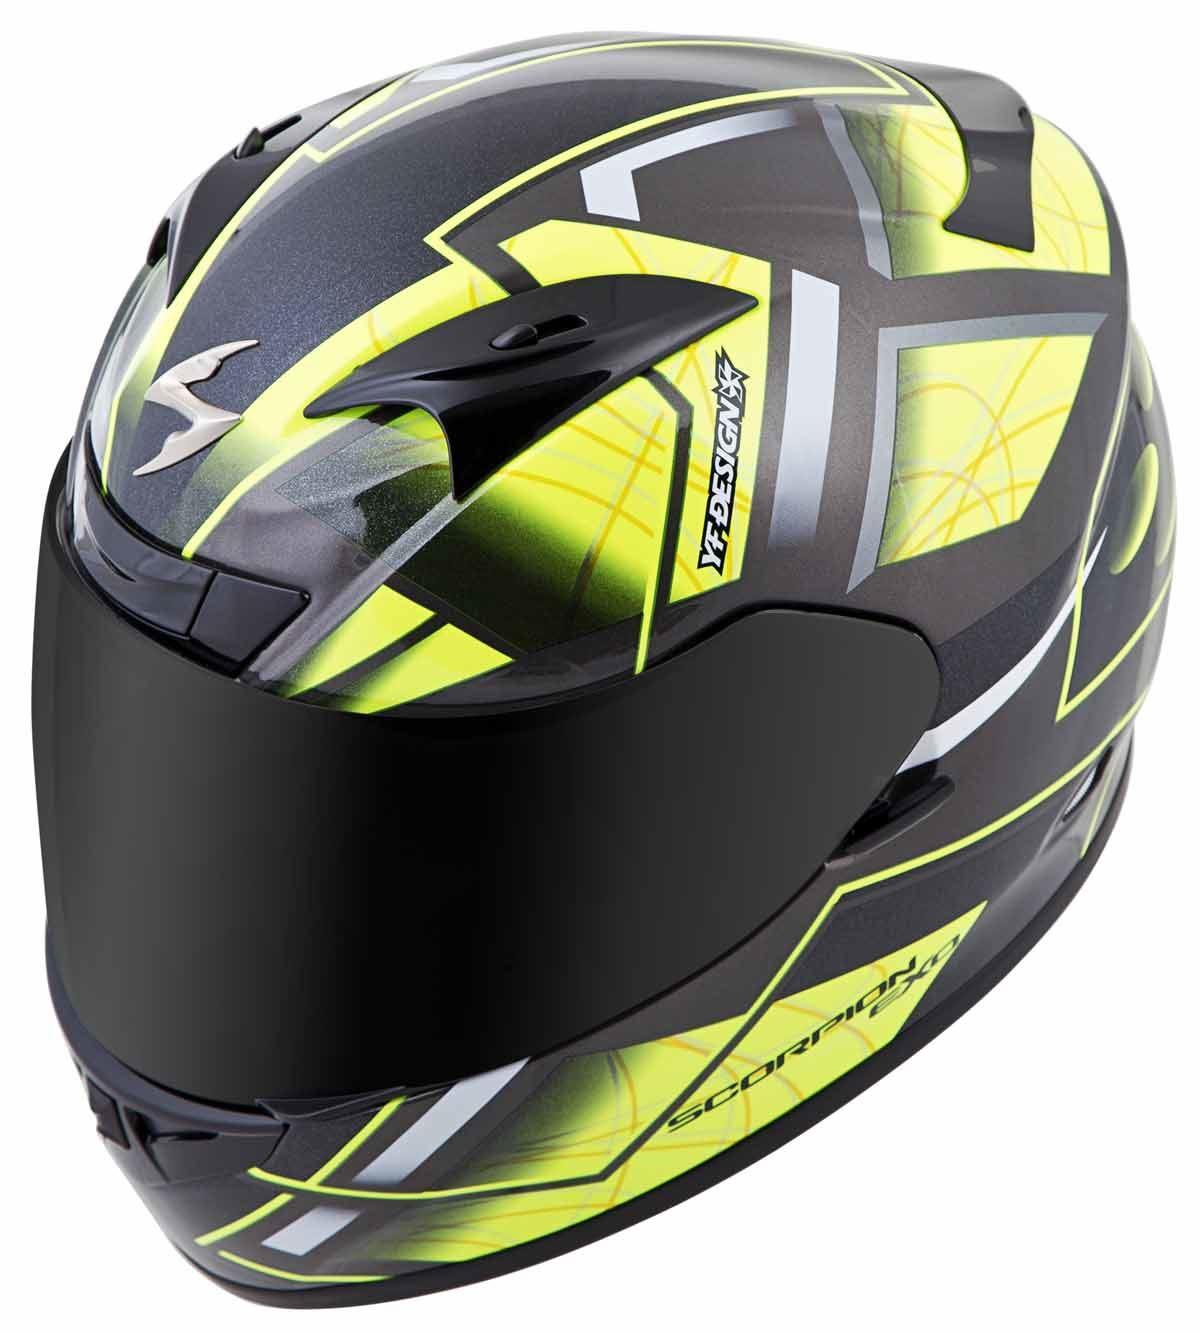 Scorpion-EXO-R710-Helmet-Fiberglass-Full-Face-DOT-SNELL-M2015-Certified-XS-2XL miniature 27